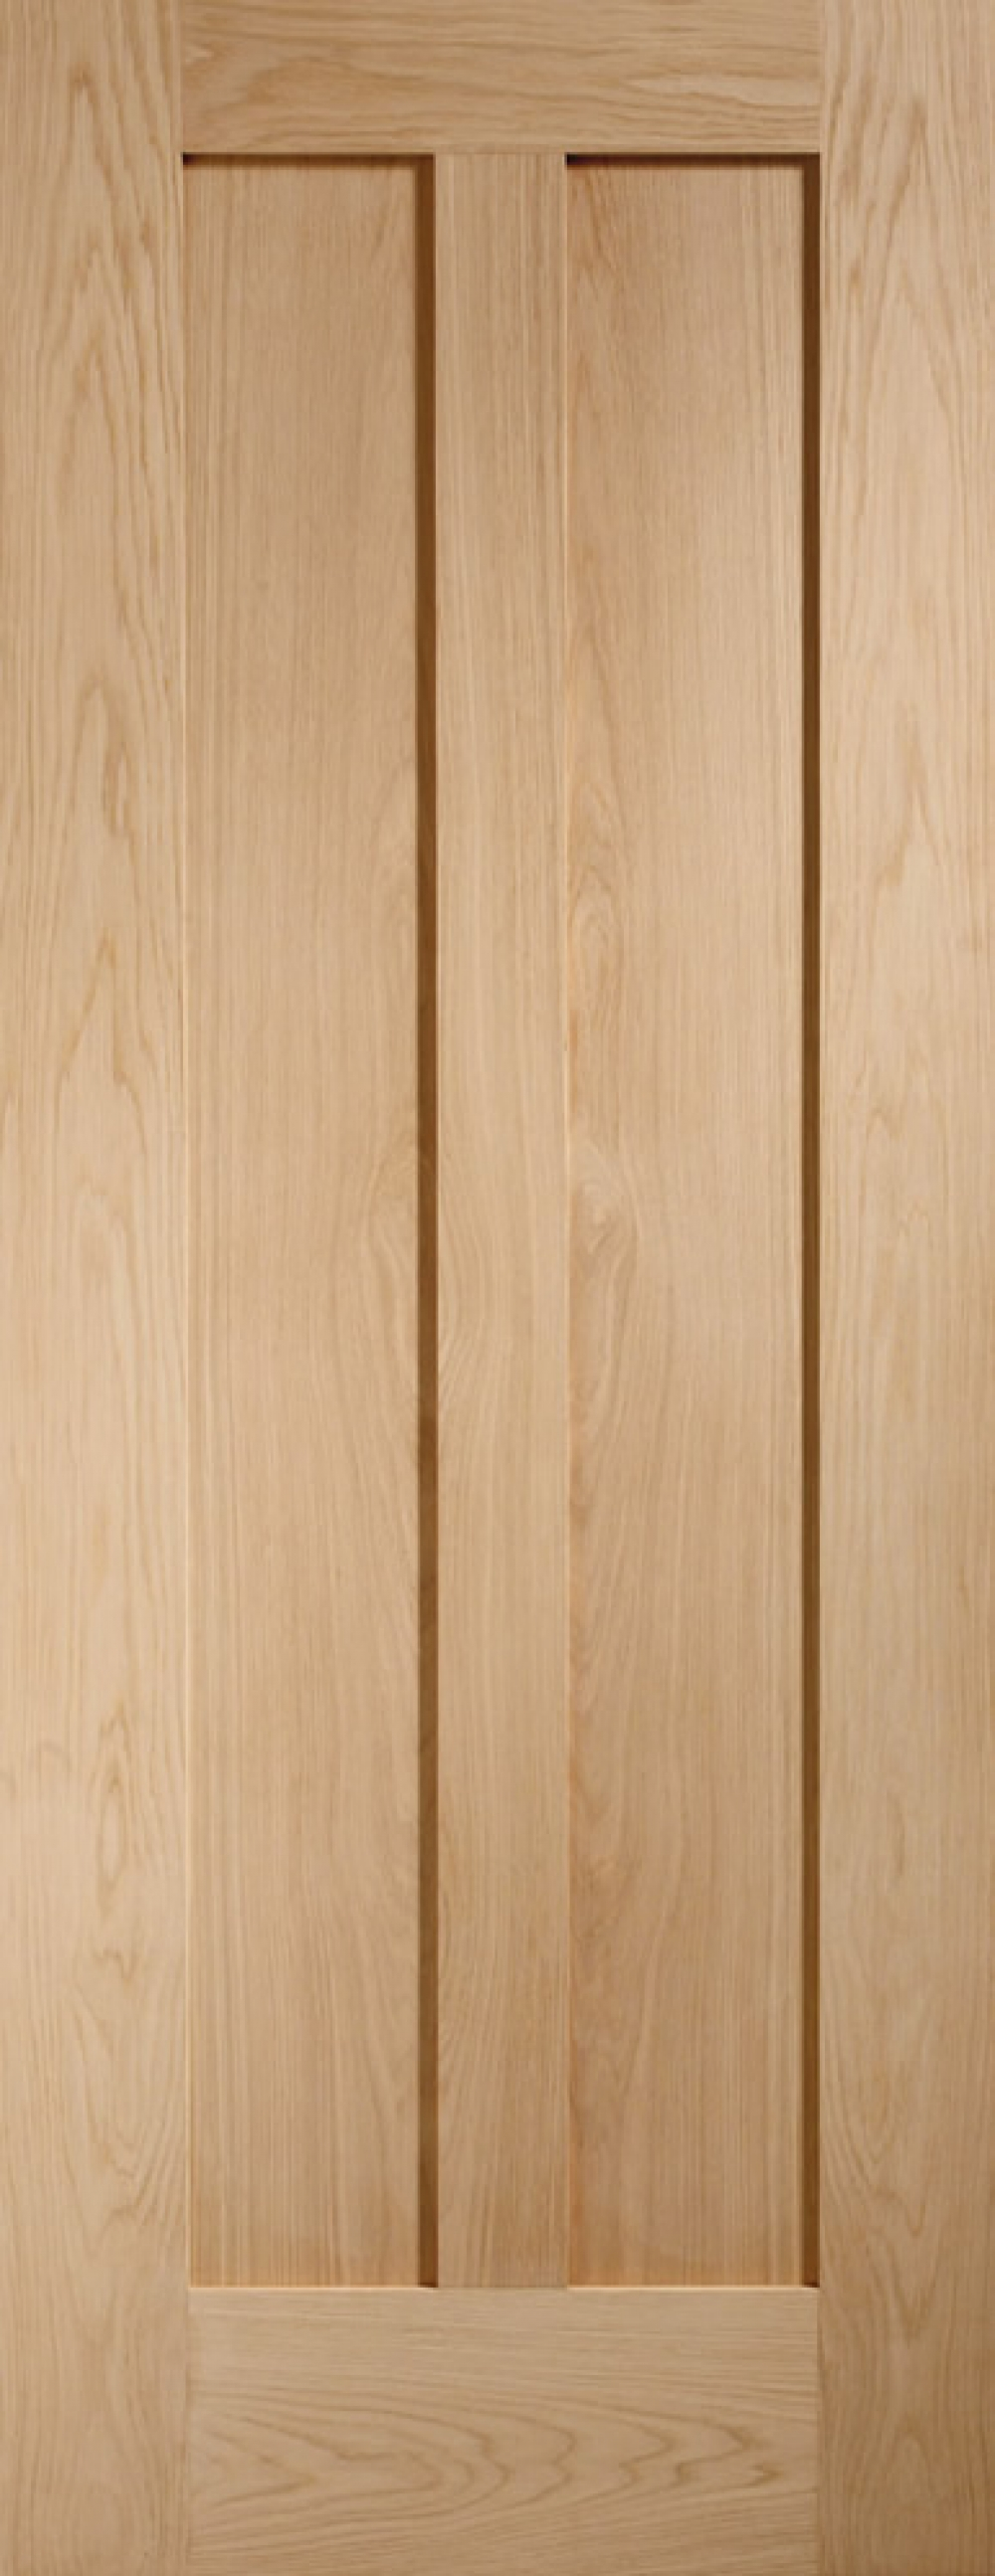 Novara Oak Door